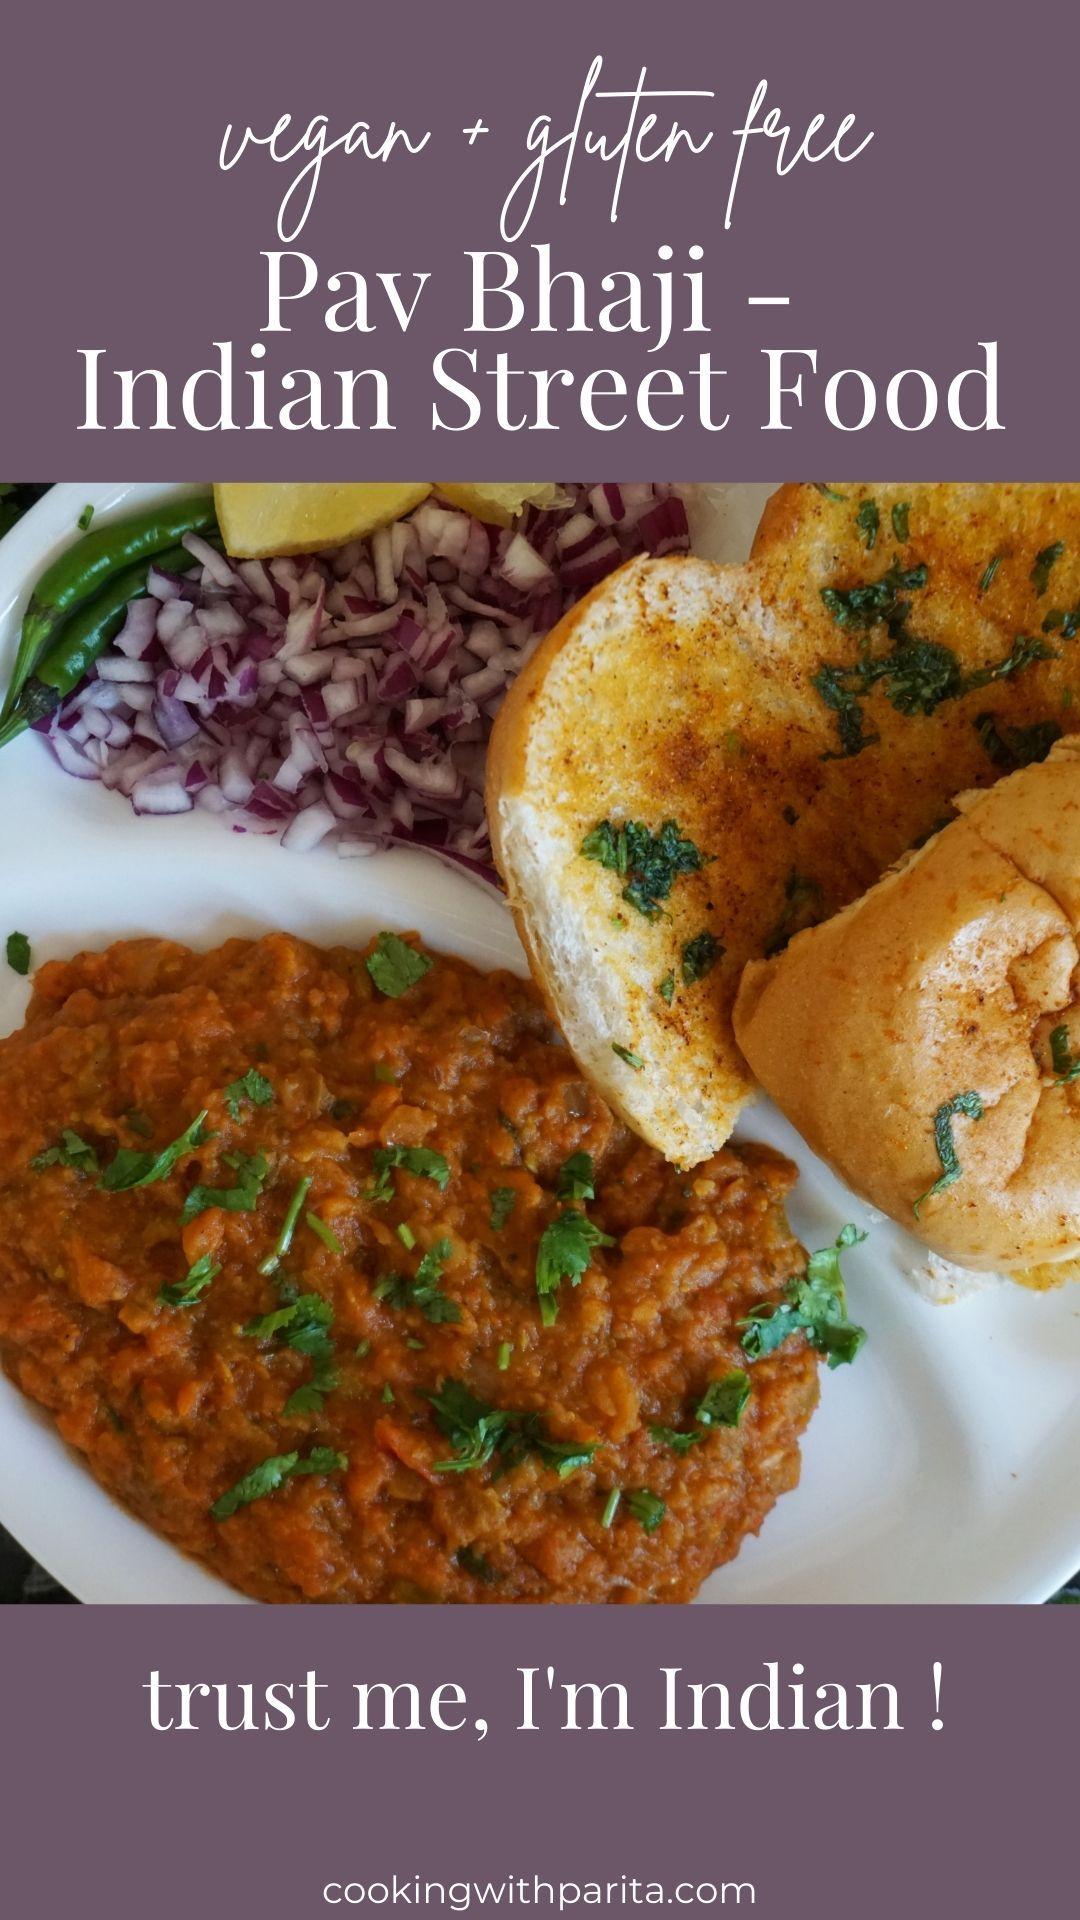 Pav Bhaji - Indian Street Food